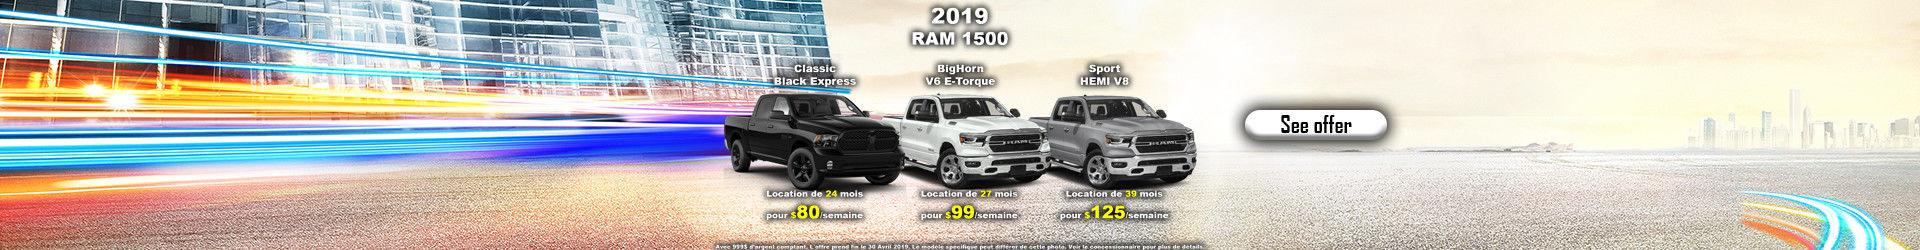 Promo RAM